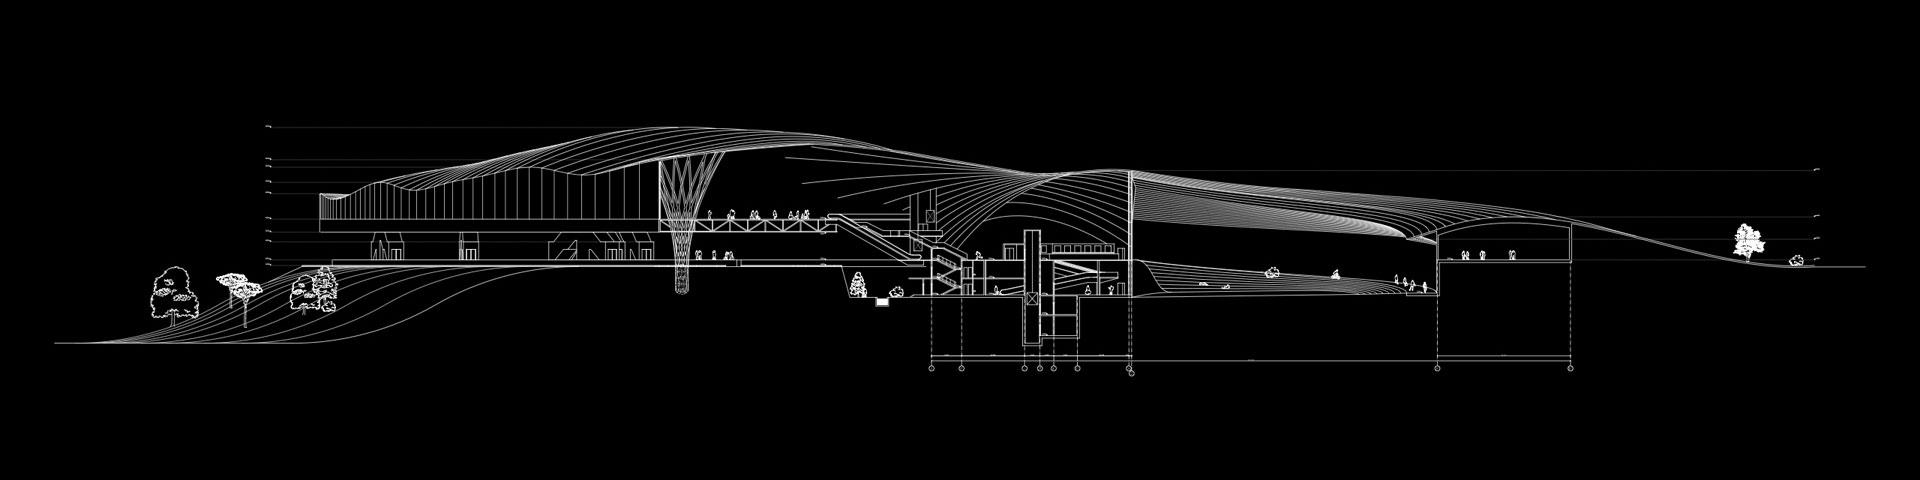 Сырец транспортный узел проект архитектурный разрез